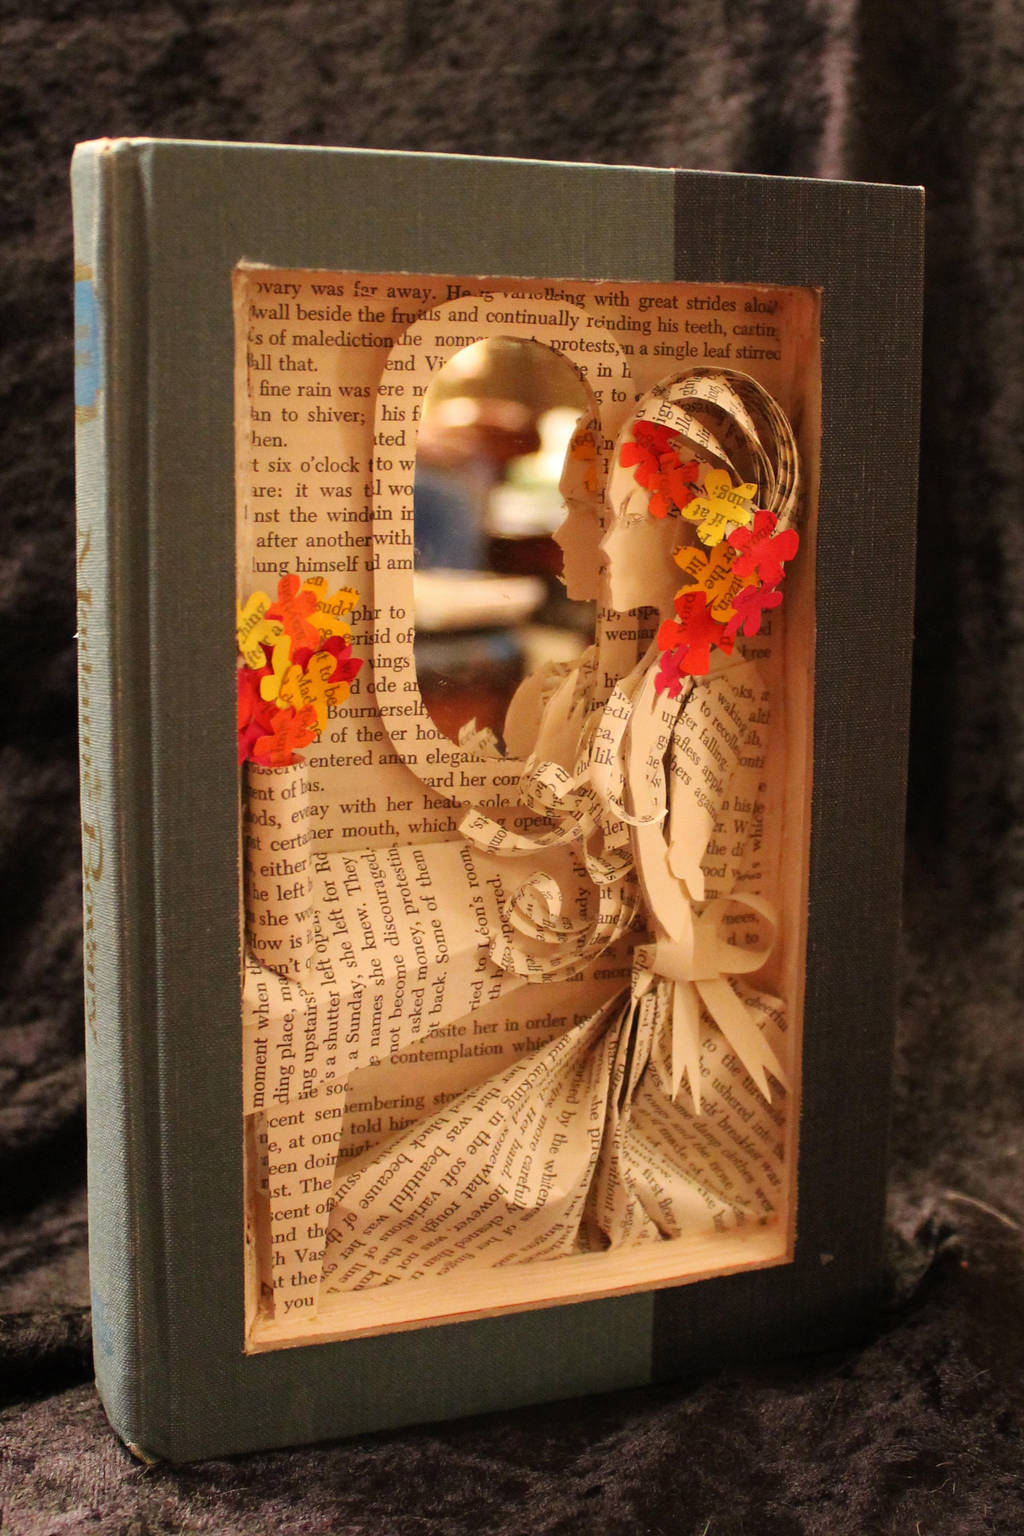 madam_bovary_book_sculpture_by_wetcanvas_d5v6xqy-fullview.jpg